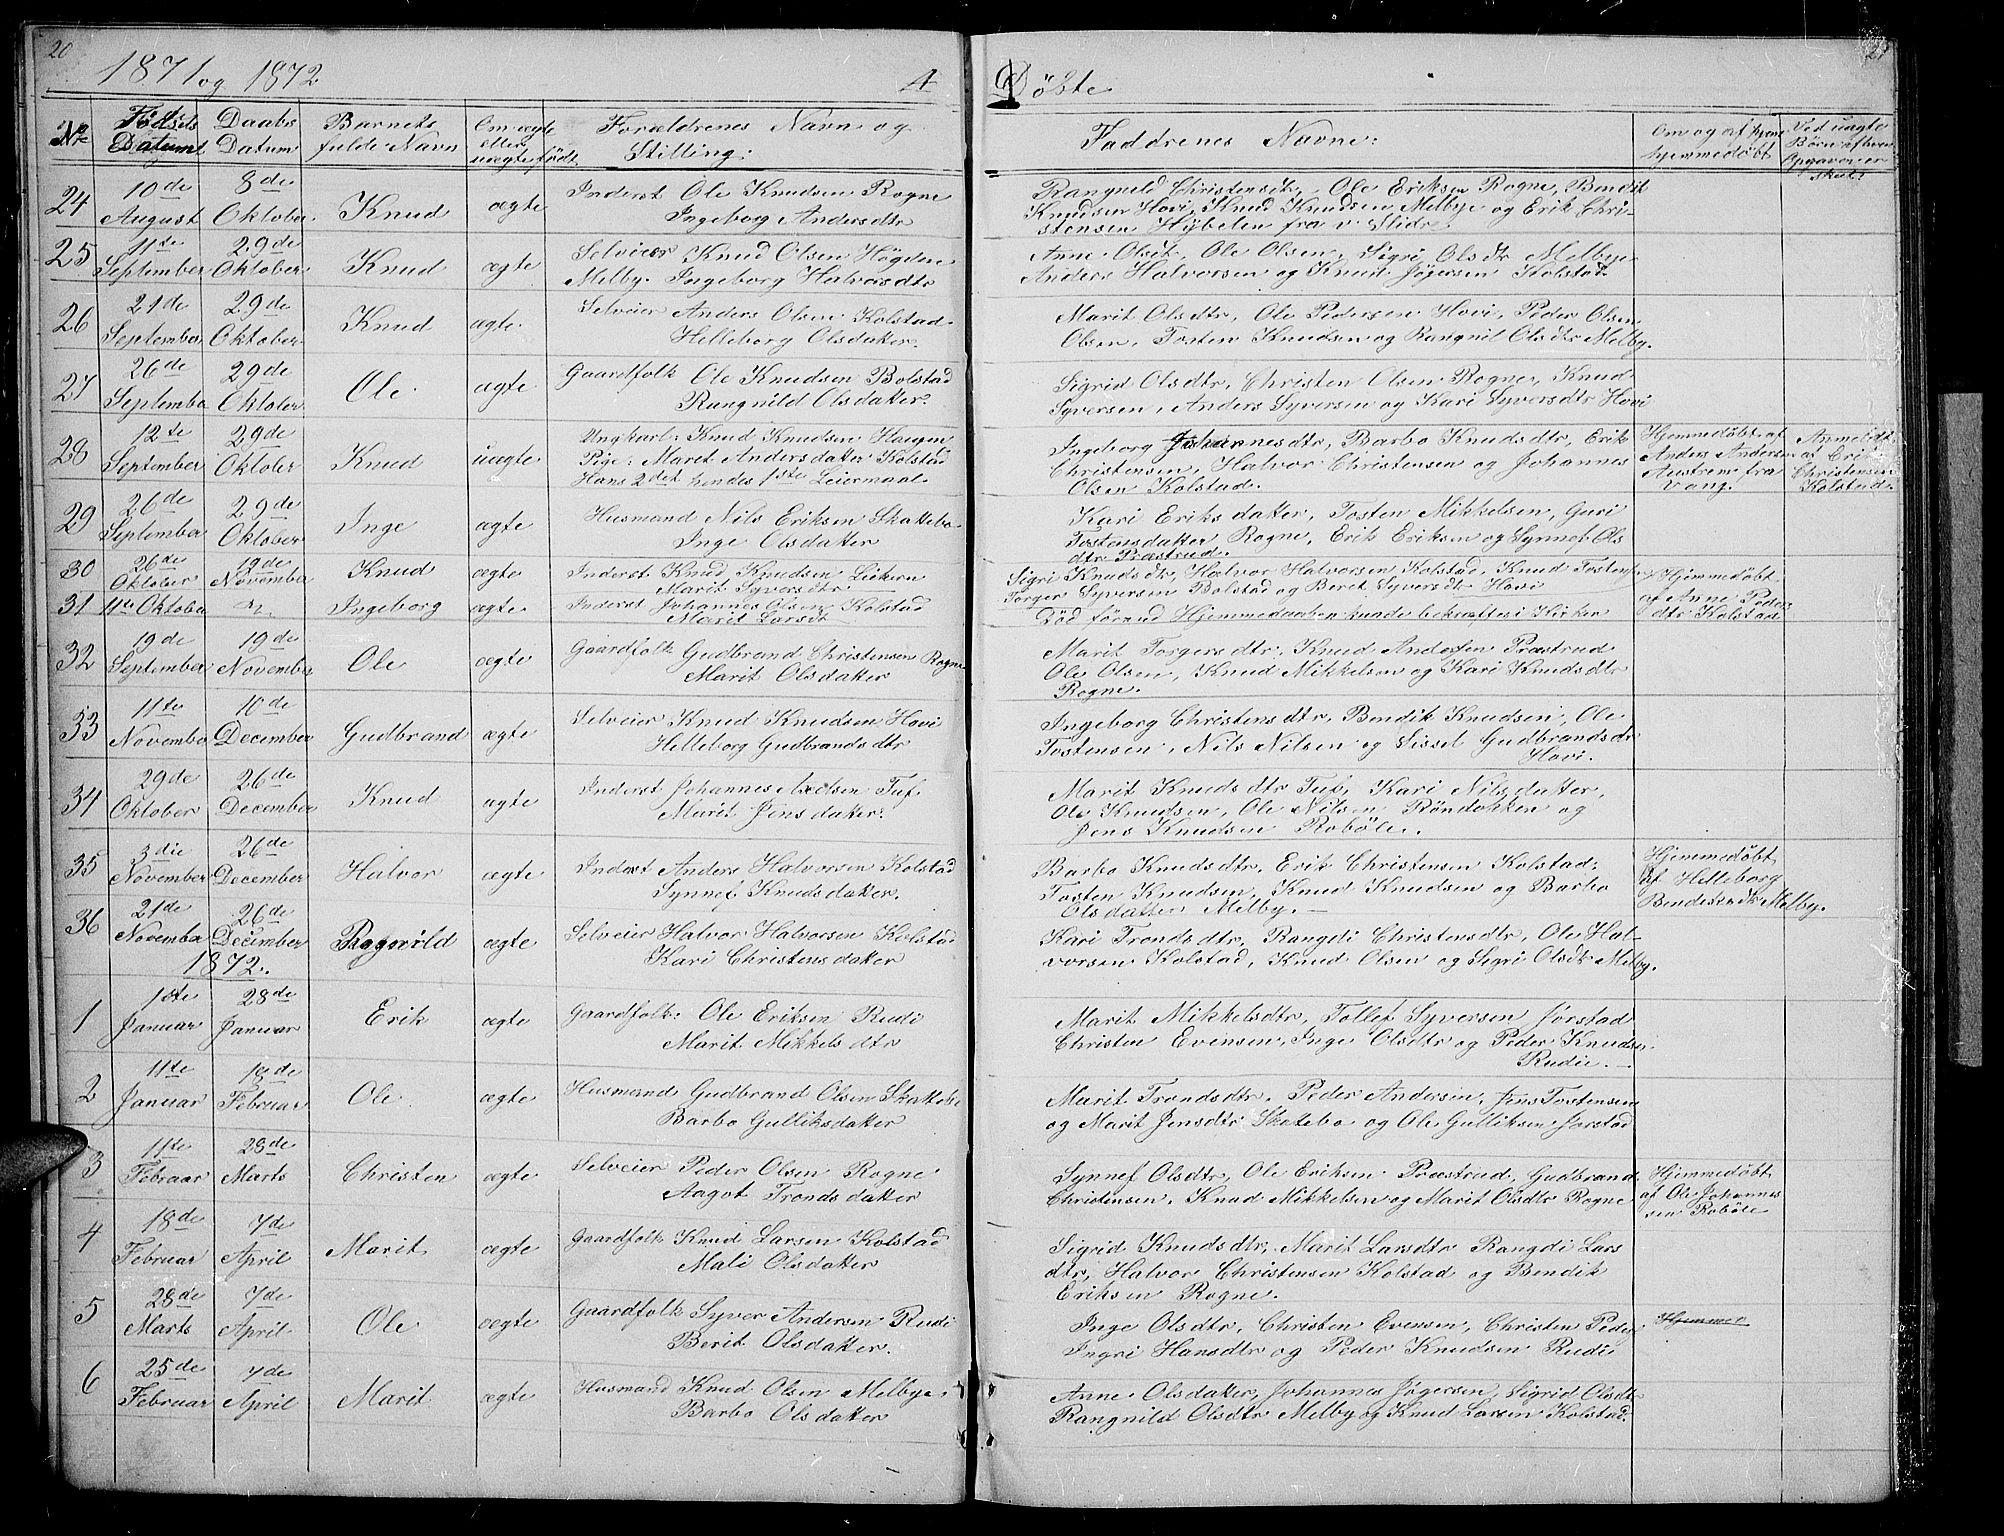 SAH, Øystre Slidre prestekontor, Klokkerbok nr. 3, 1866-1886, s. 20-21